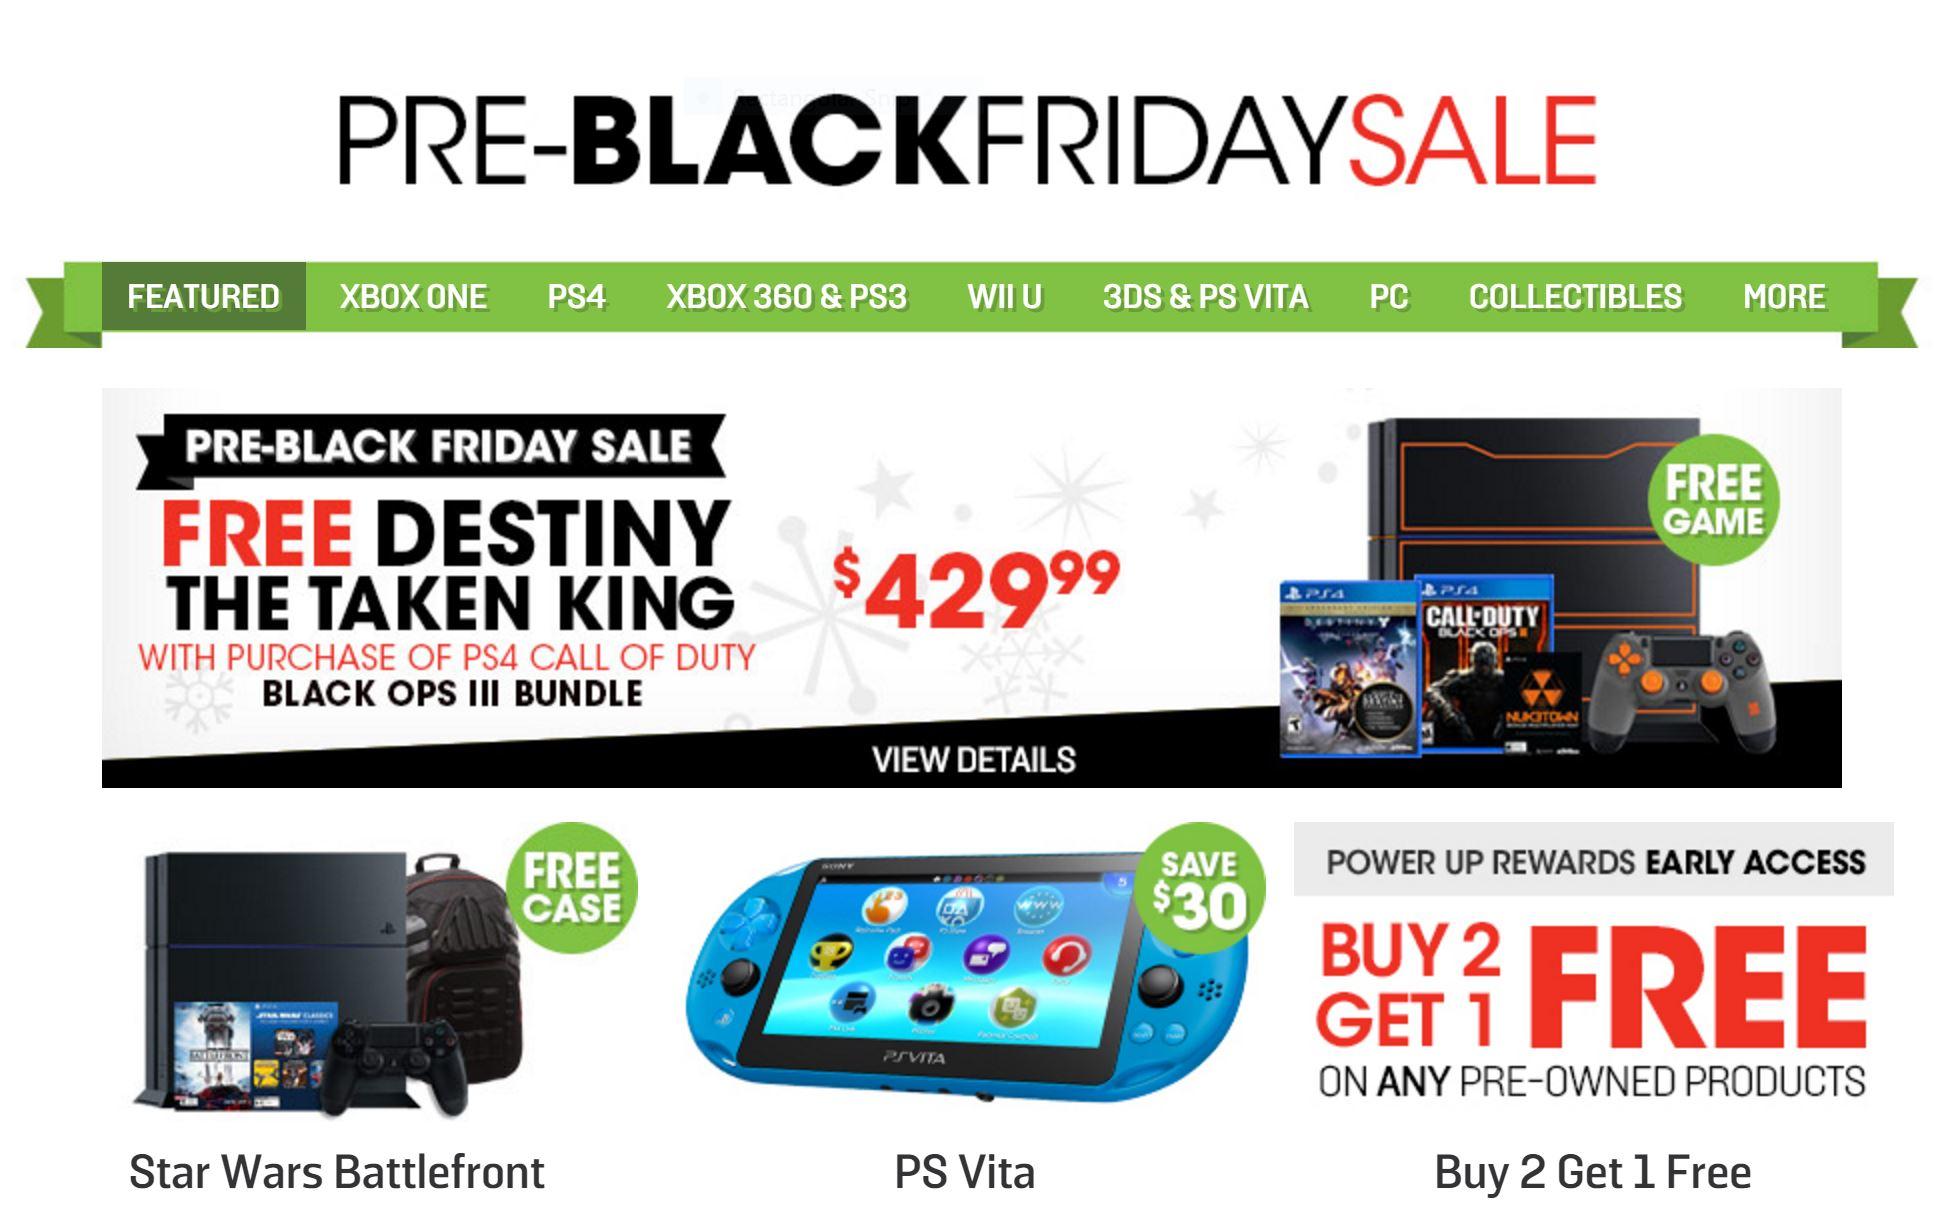 GameStop Pre-Black Friday 2015 Deals Amp Up the Savings